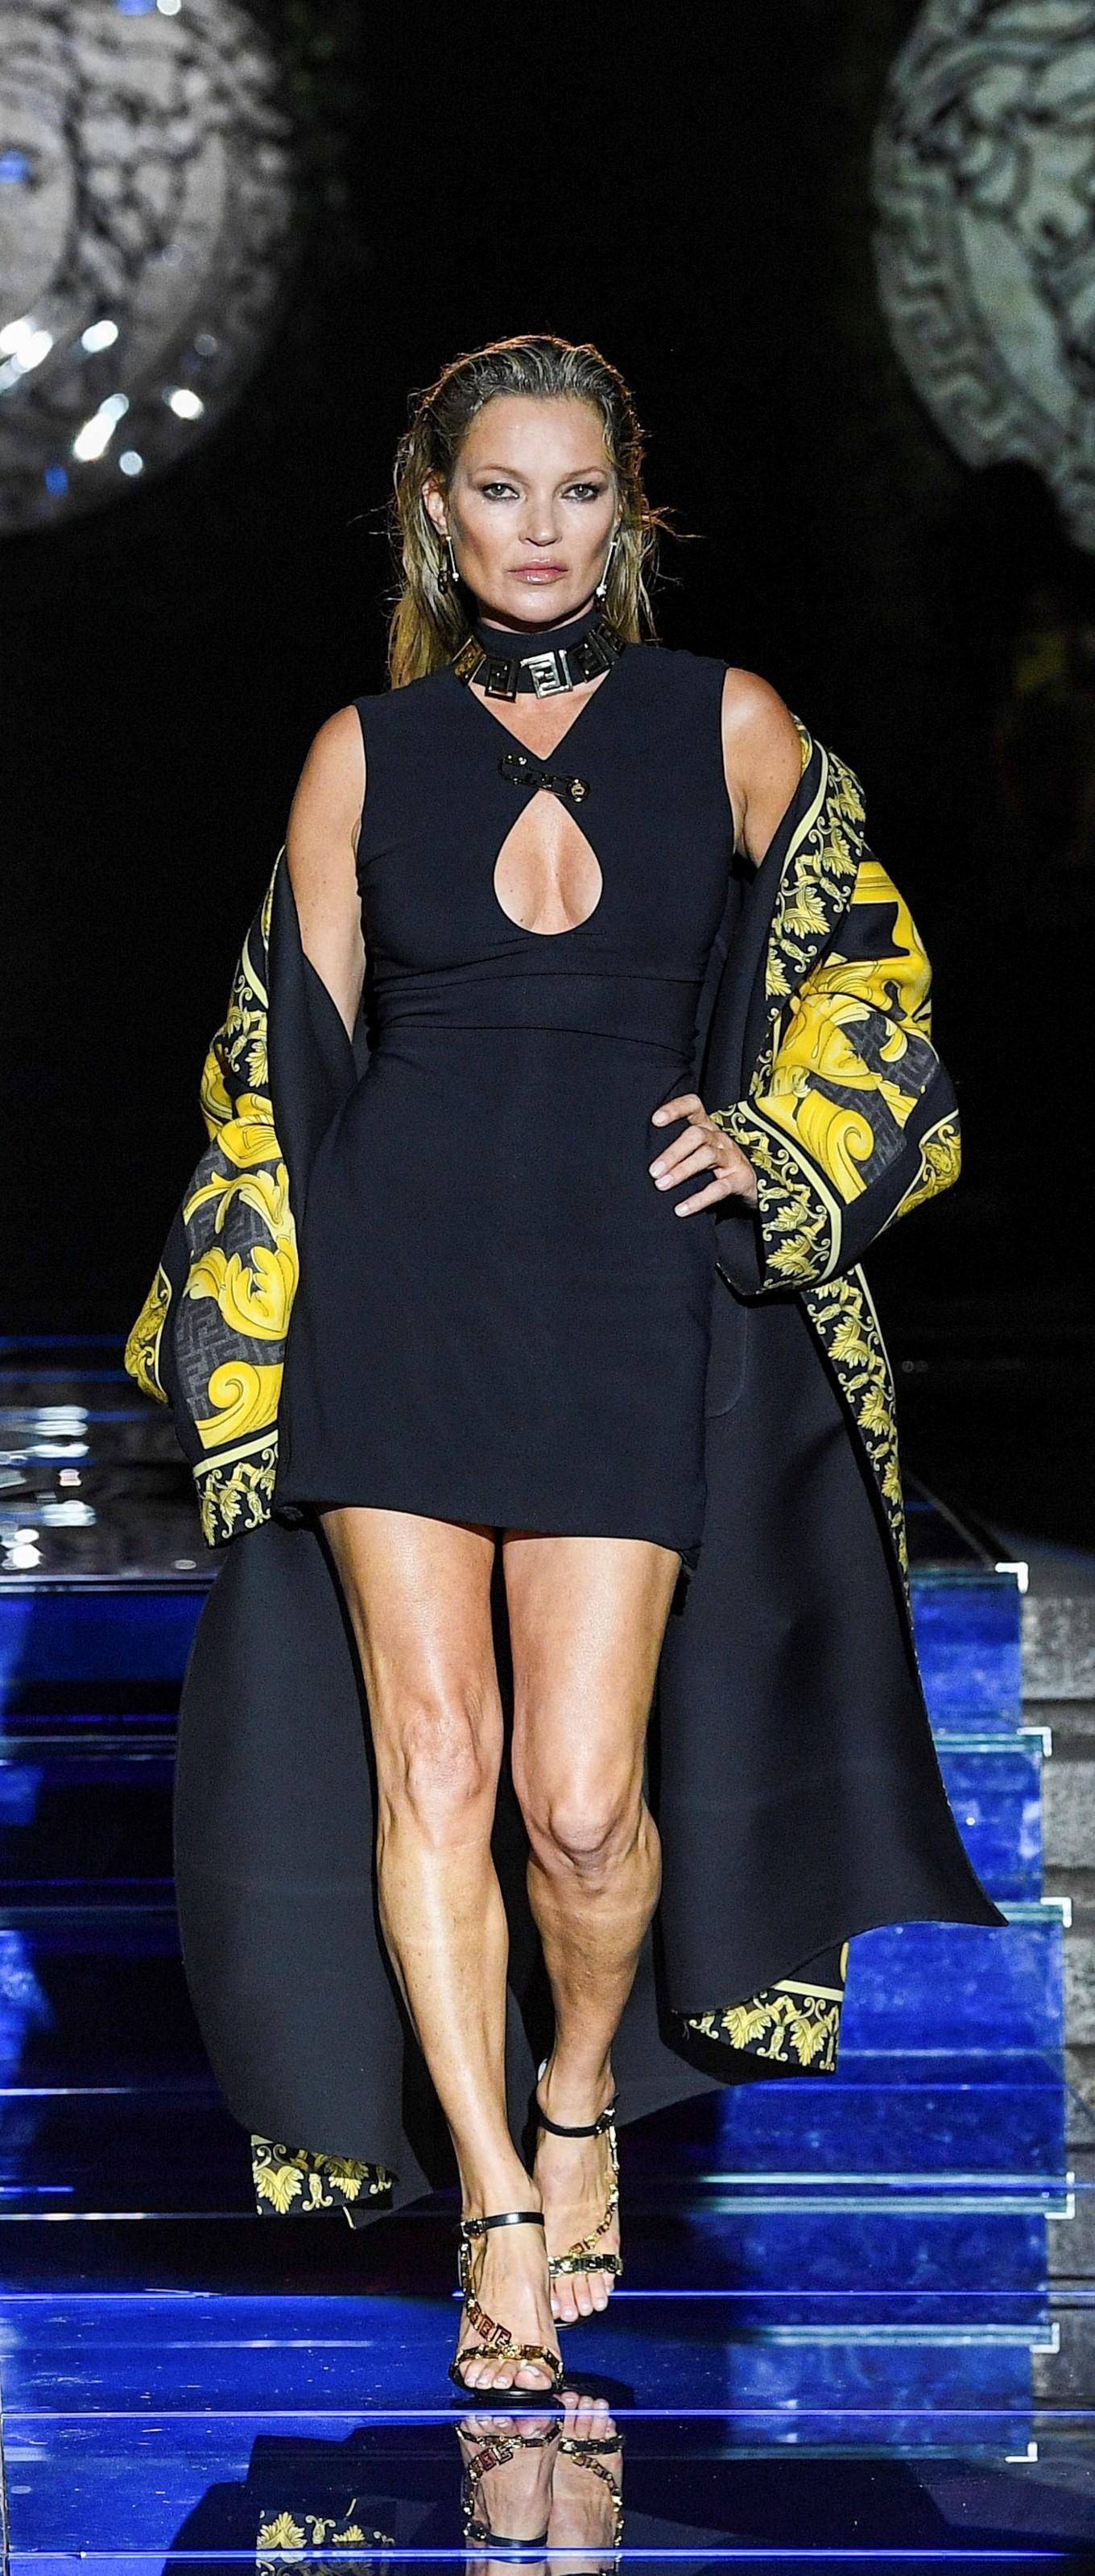 Kate Moss desfilando en la semana de la moda de Milán.